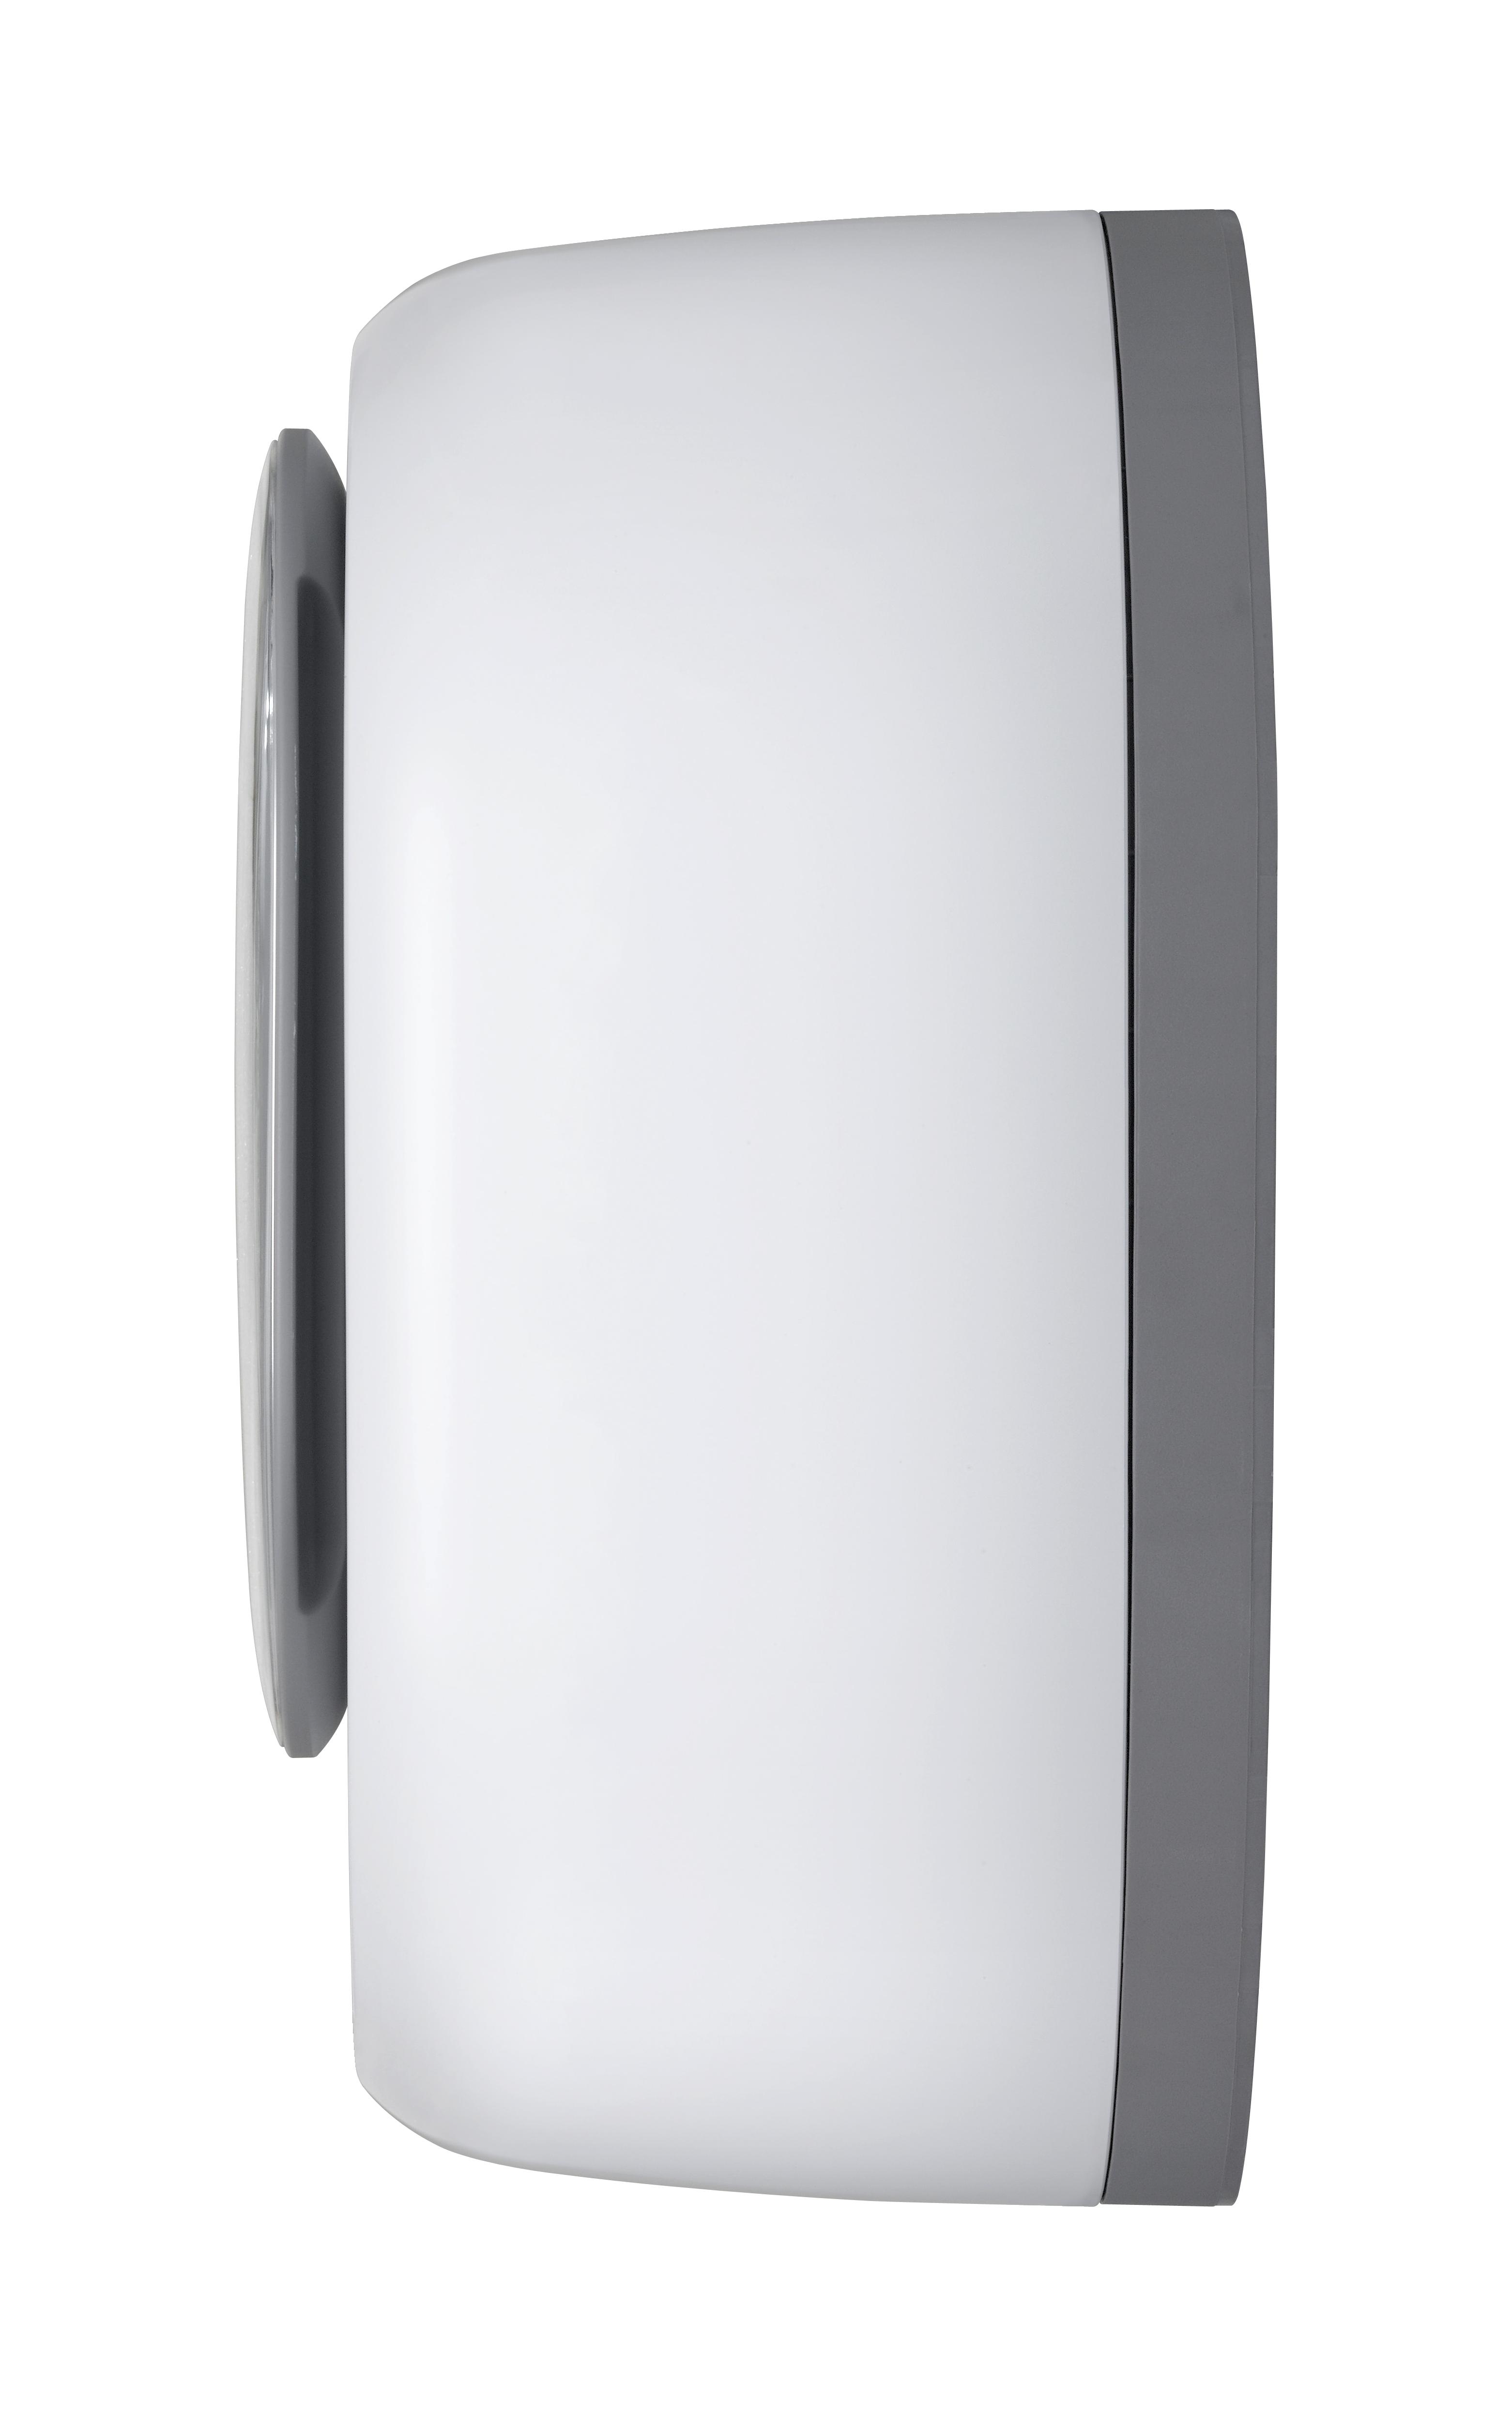 Daewoo Mini Wasmachine Washing Machine 3 Kg Dwd Cv702wp